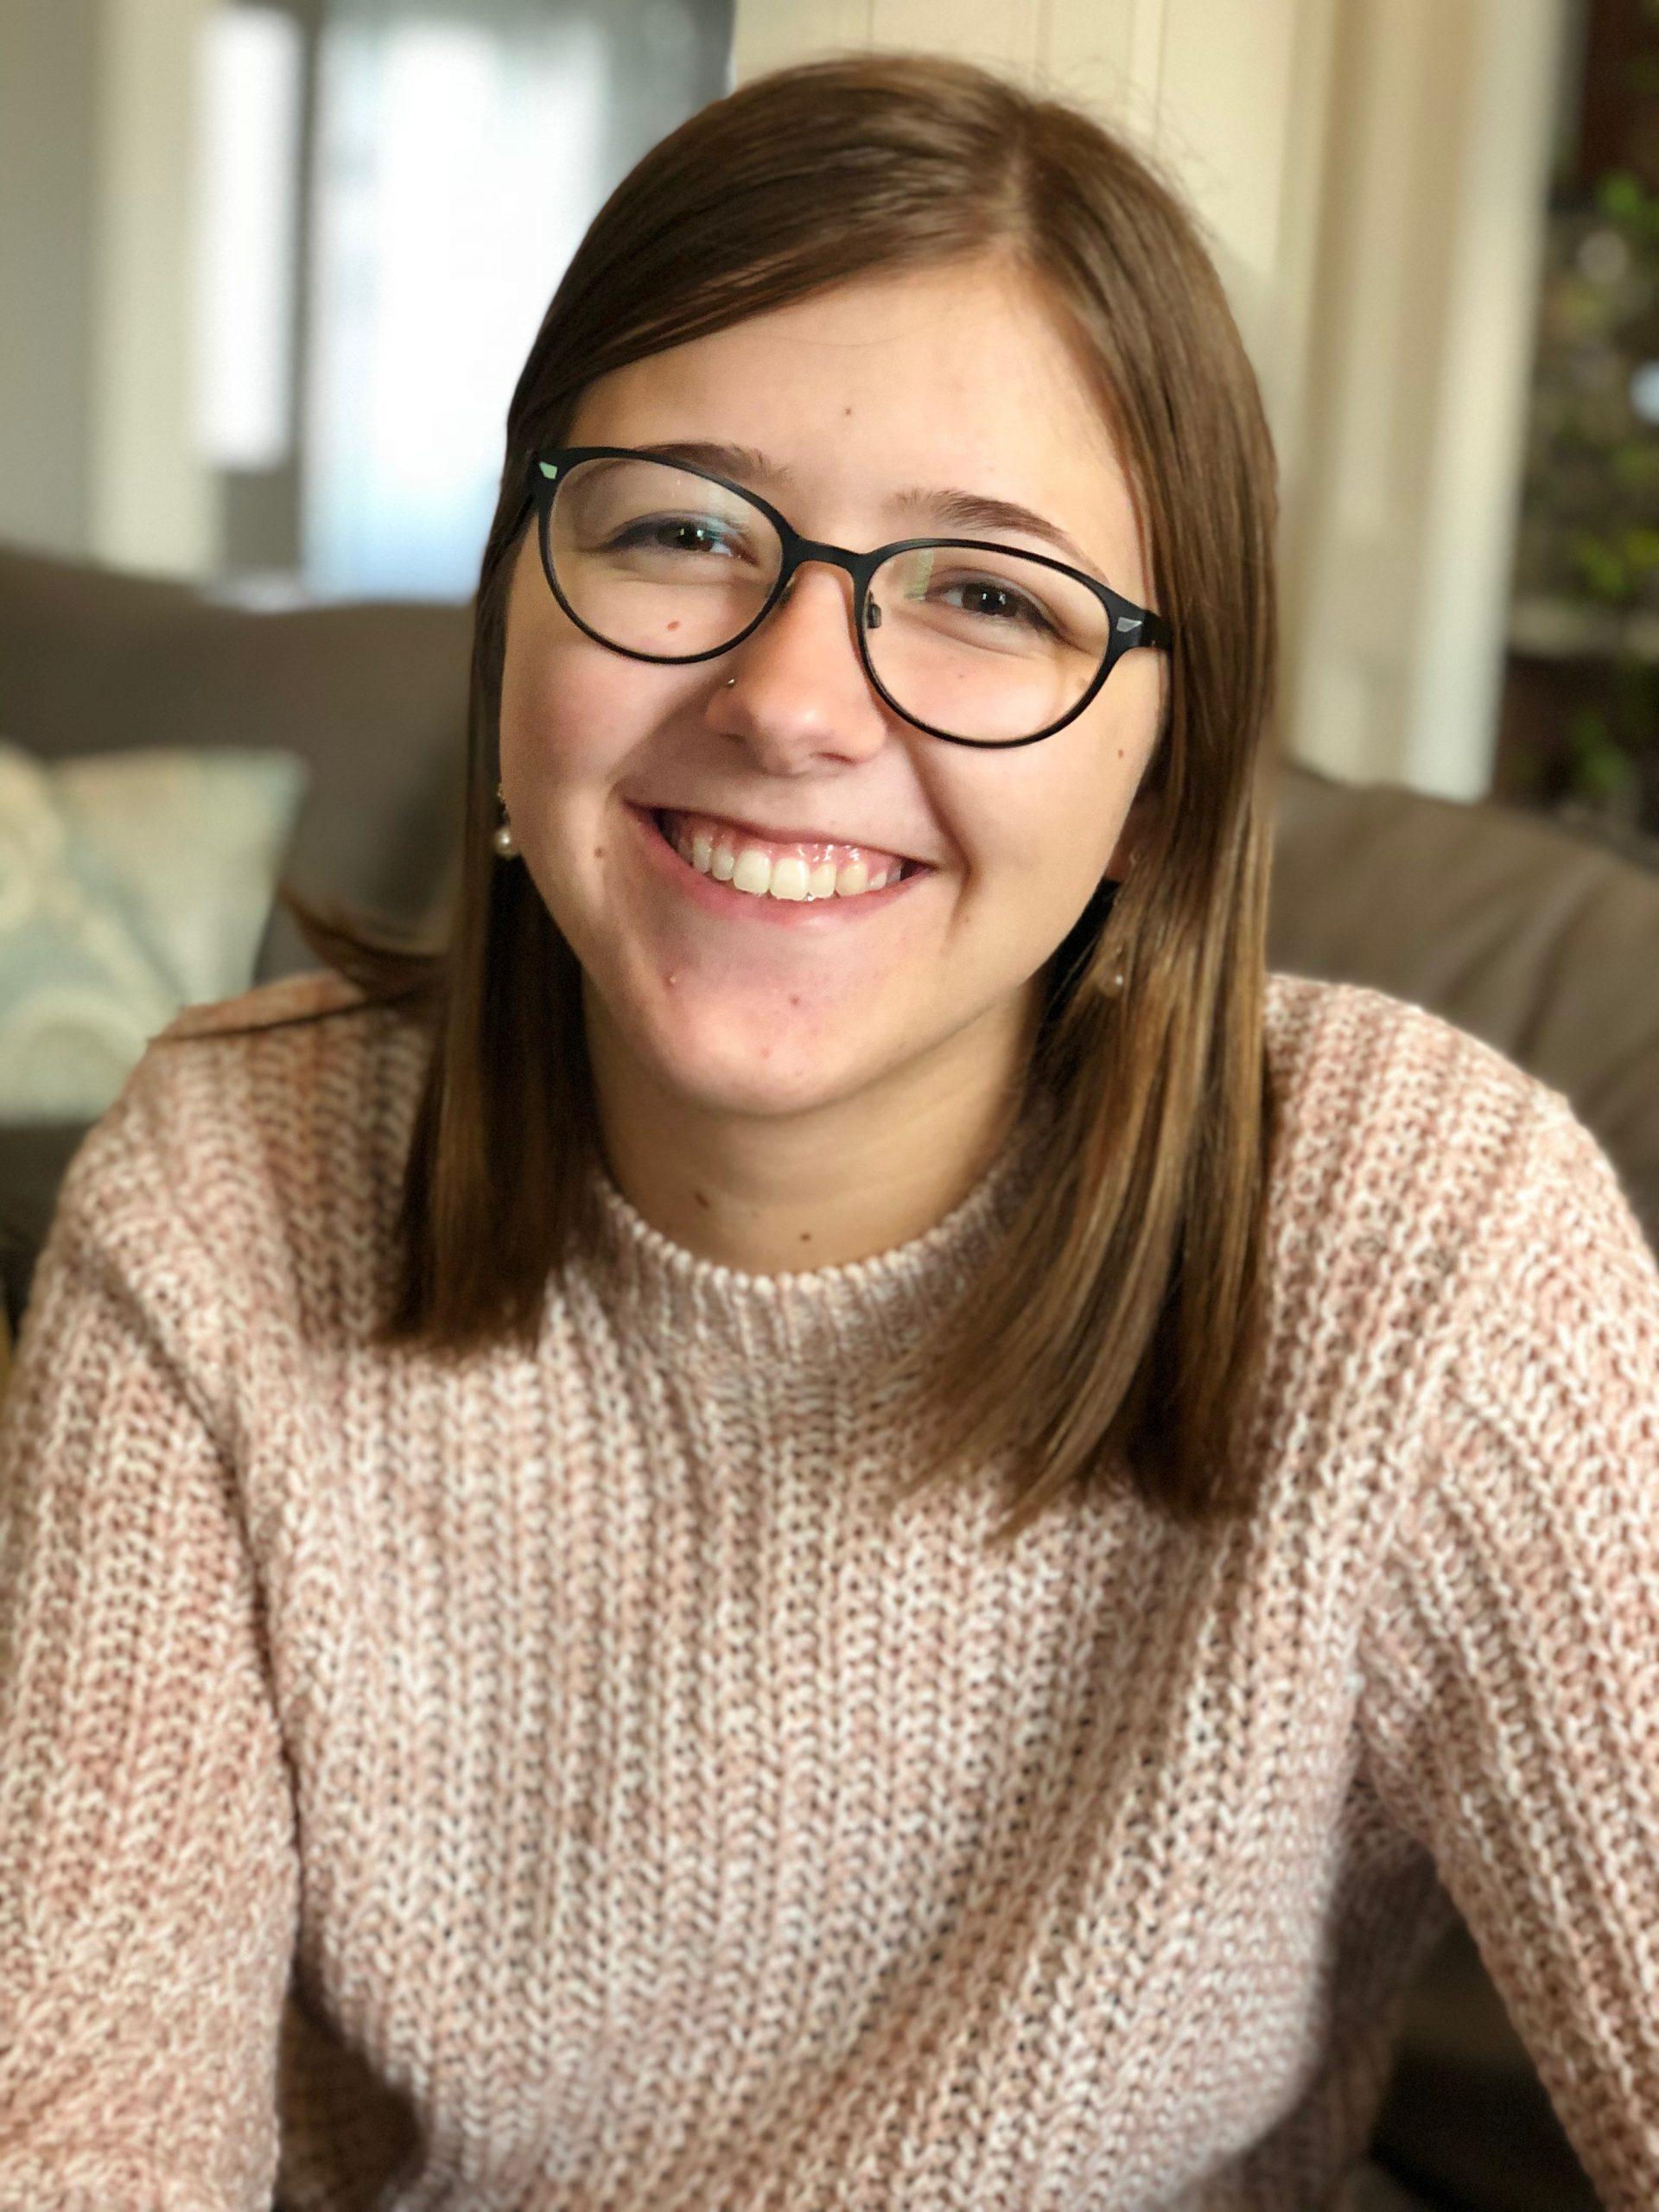 Katherine Stark